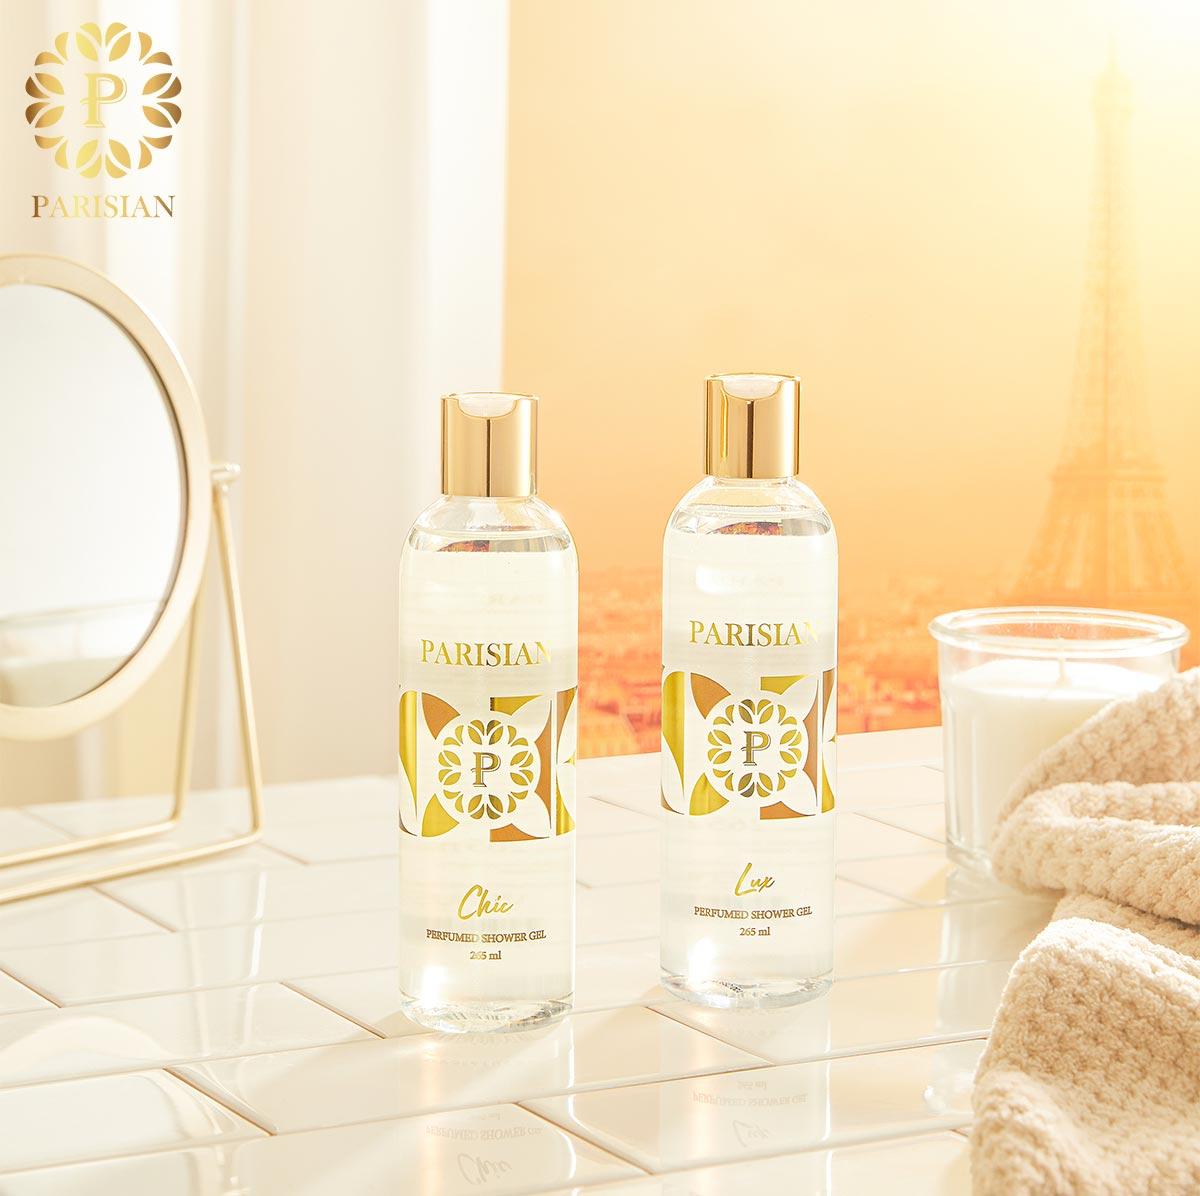 Sữa Tắm Nước Hoa Nữ Parisian Perfumed Shower Gel For Her